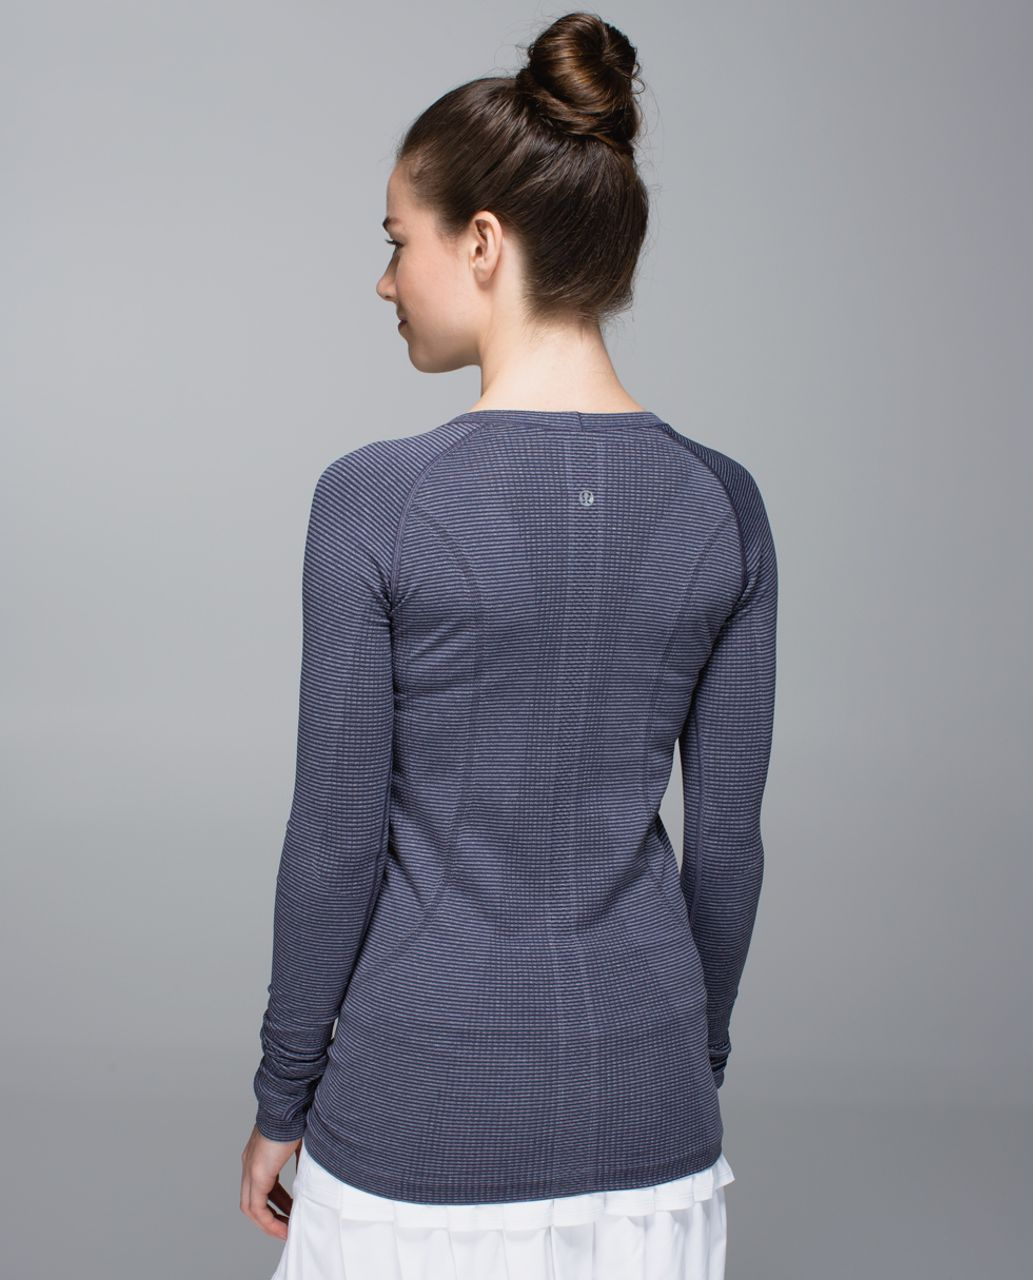 Lululemon Run:  Swiftly Tech Long Sleeve Scoop - Heathered Cadet Blue